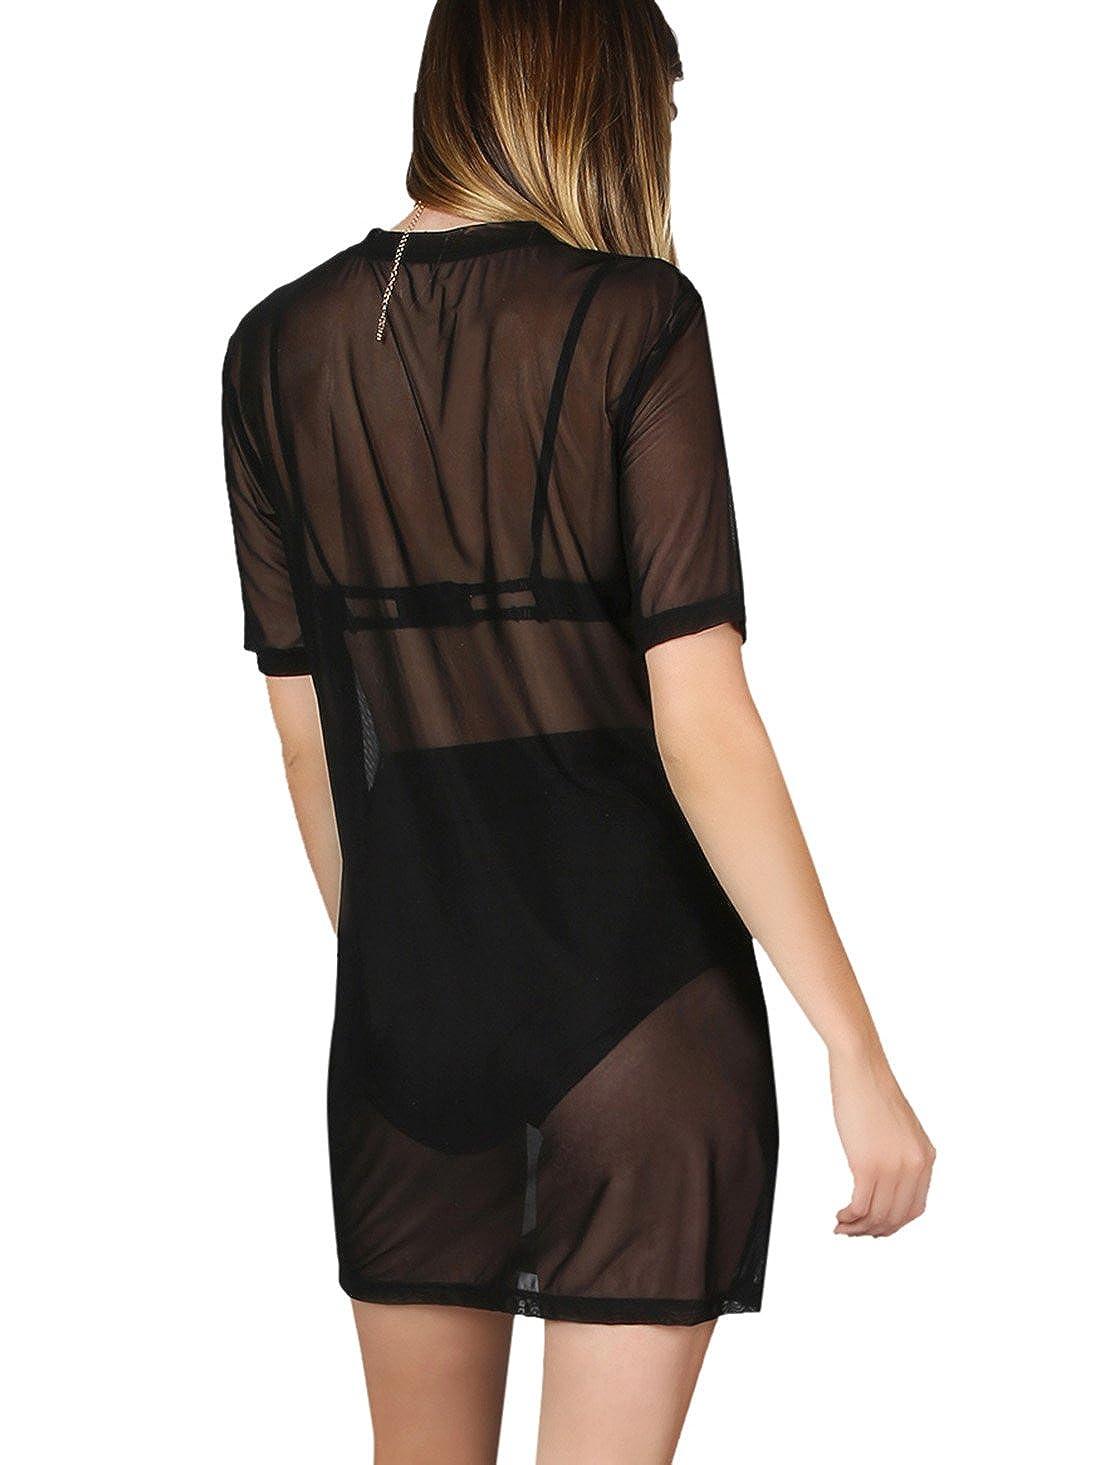 e200e82ce3 MAKEMECHIC Women's Beach Cover Ups Short Sleeve See Through Sheer Mesh T  Shirt Dress: Amazon.ca: Clothing & Accessories